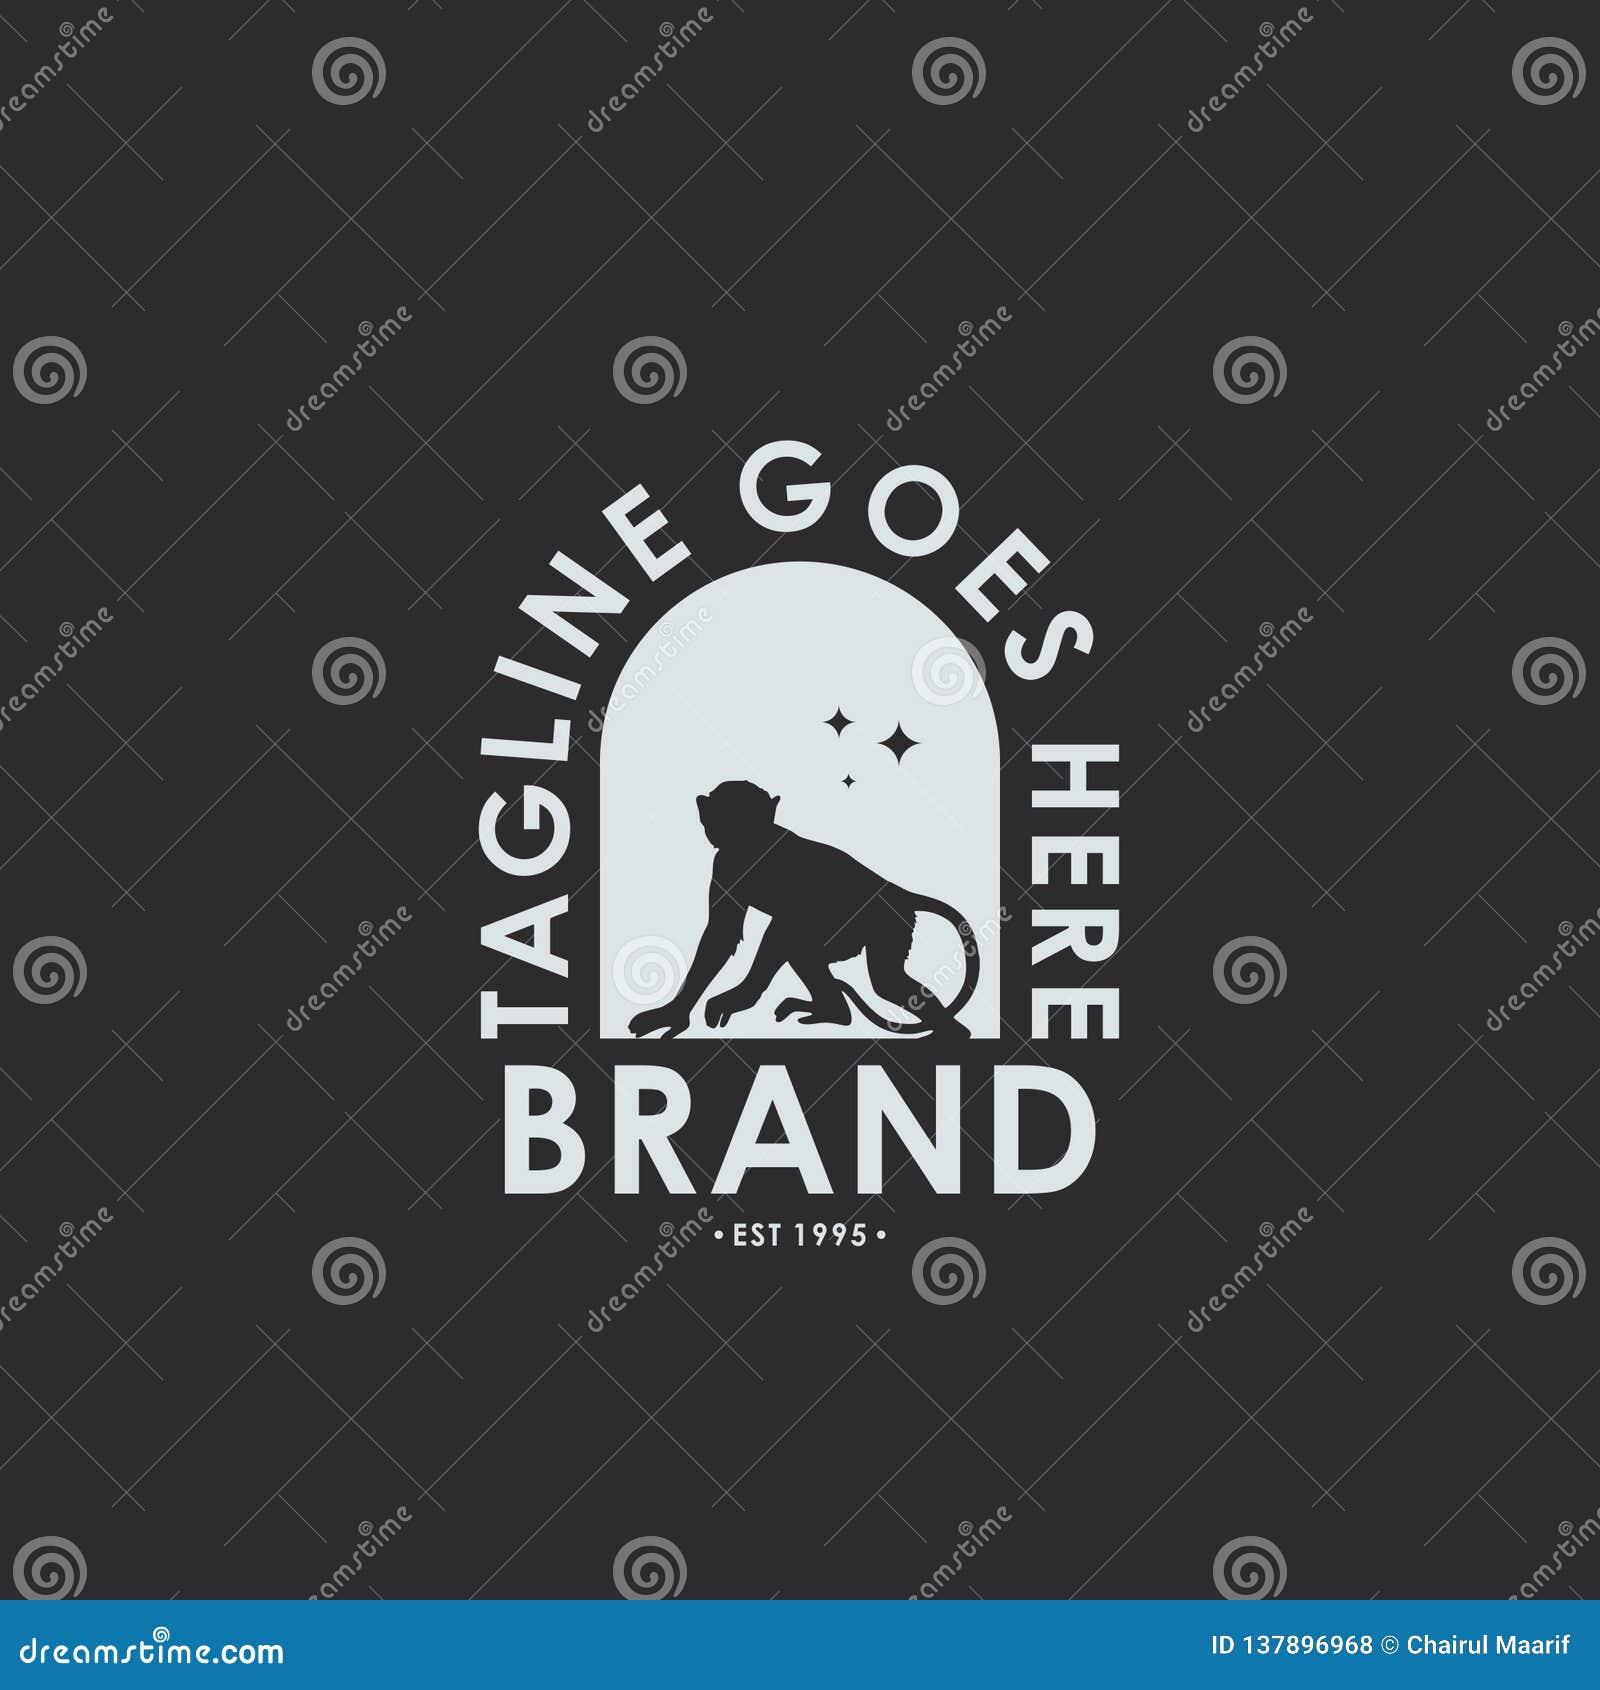 Retro vintage logo / monkey emblem Label logo design template